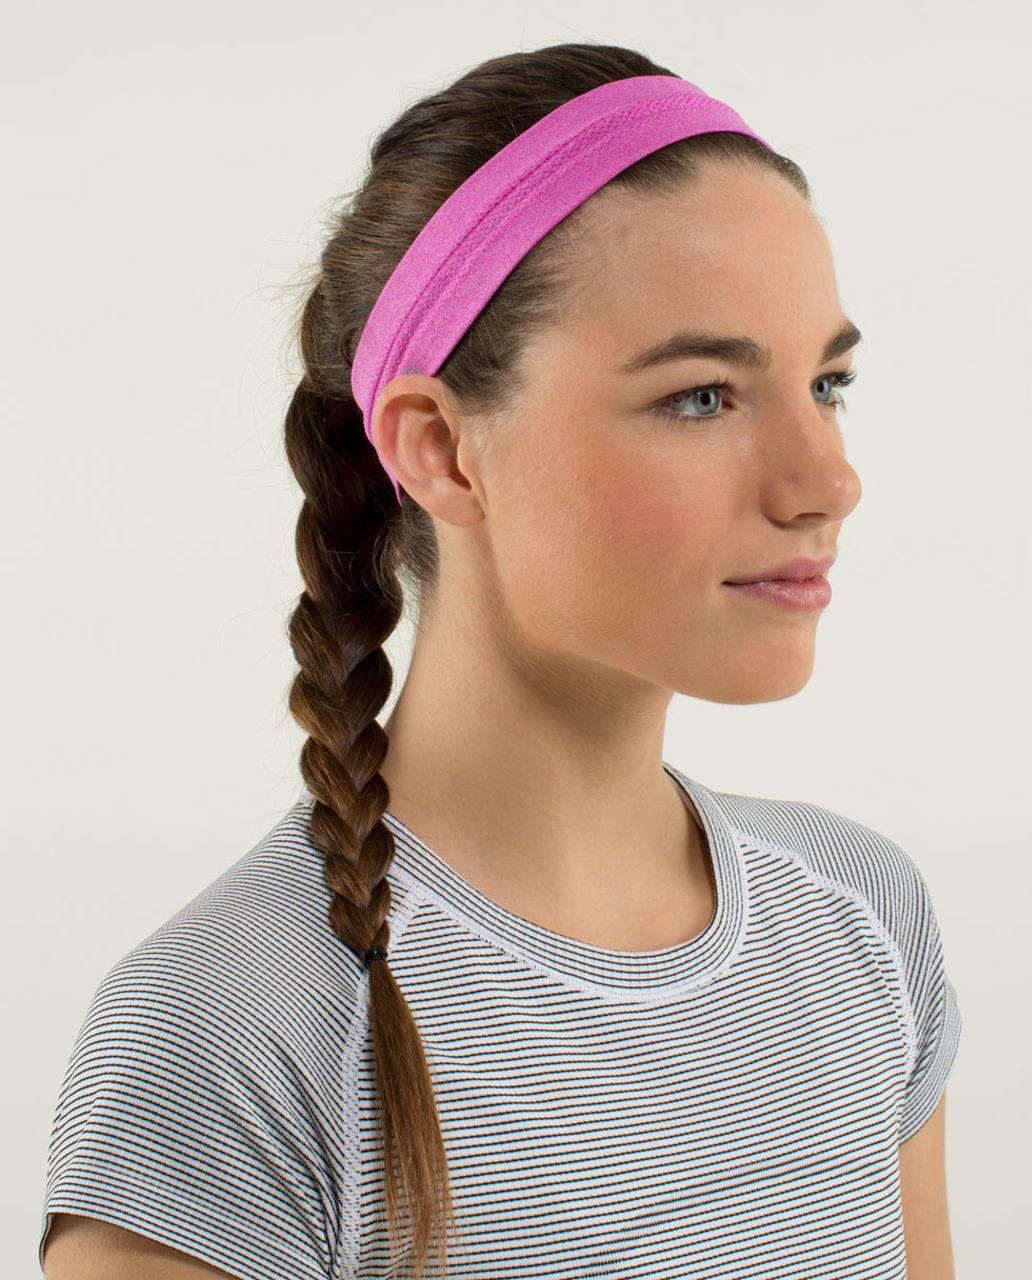 Lululemon Swiftly Headband - Heathered Paris Perfection